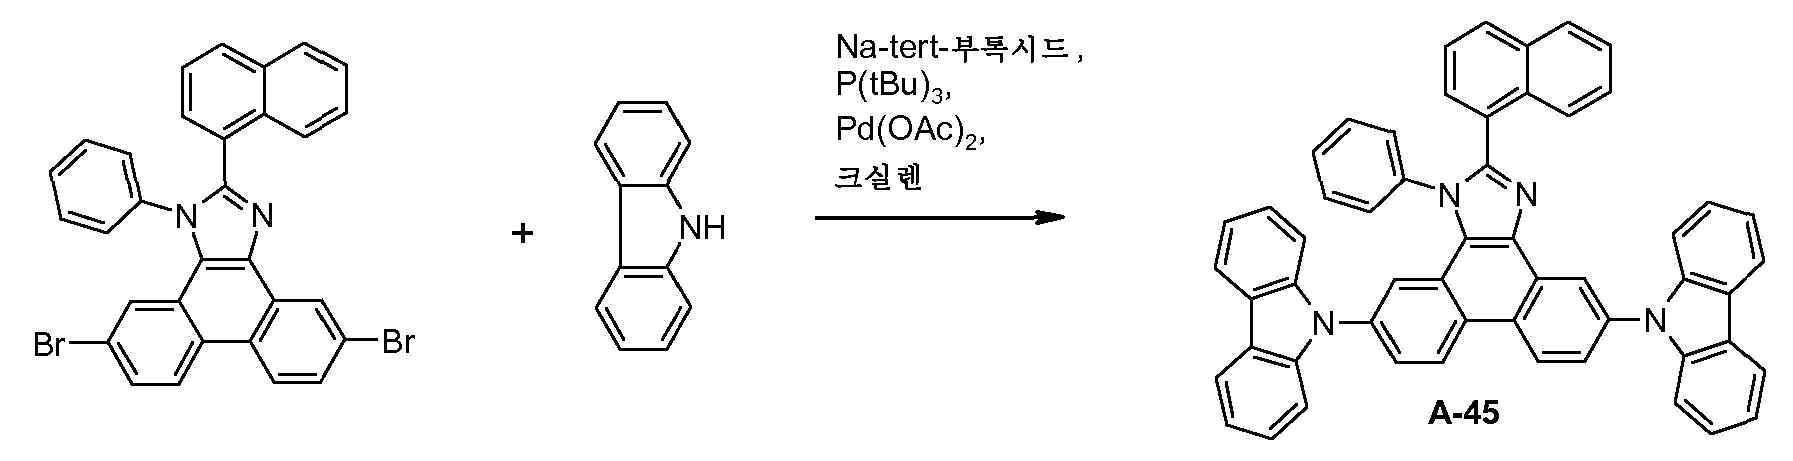 Figure 112012004234516-pct00075